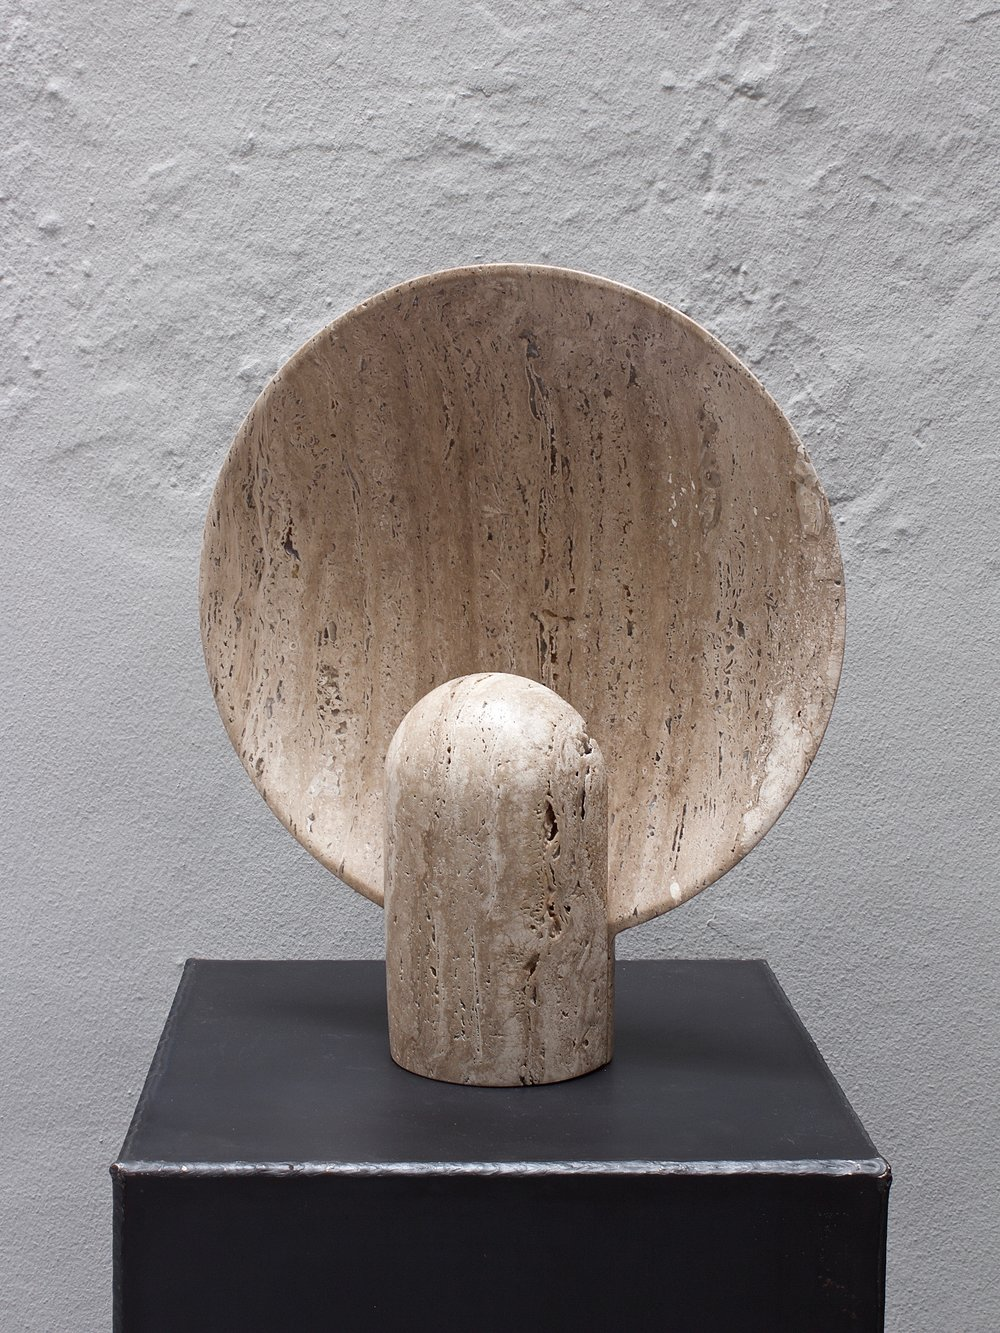 Surface Sconce Travertine Lamp <i><br>22.500 DKK</i>